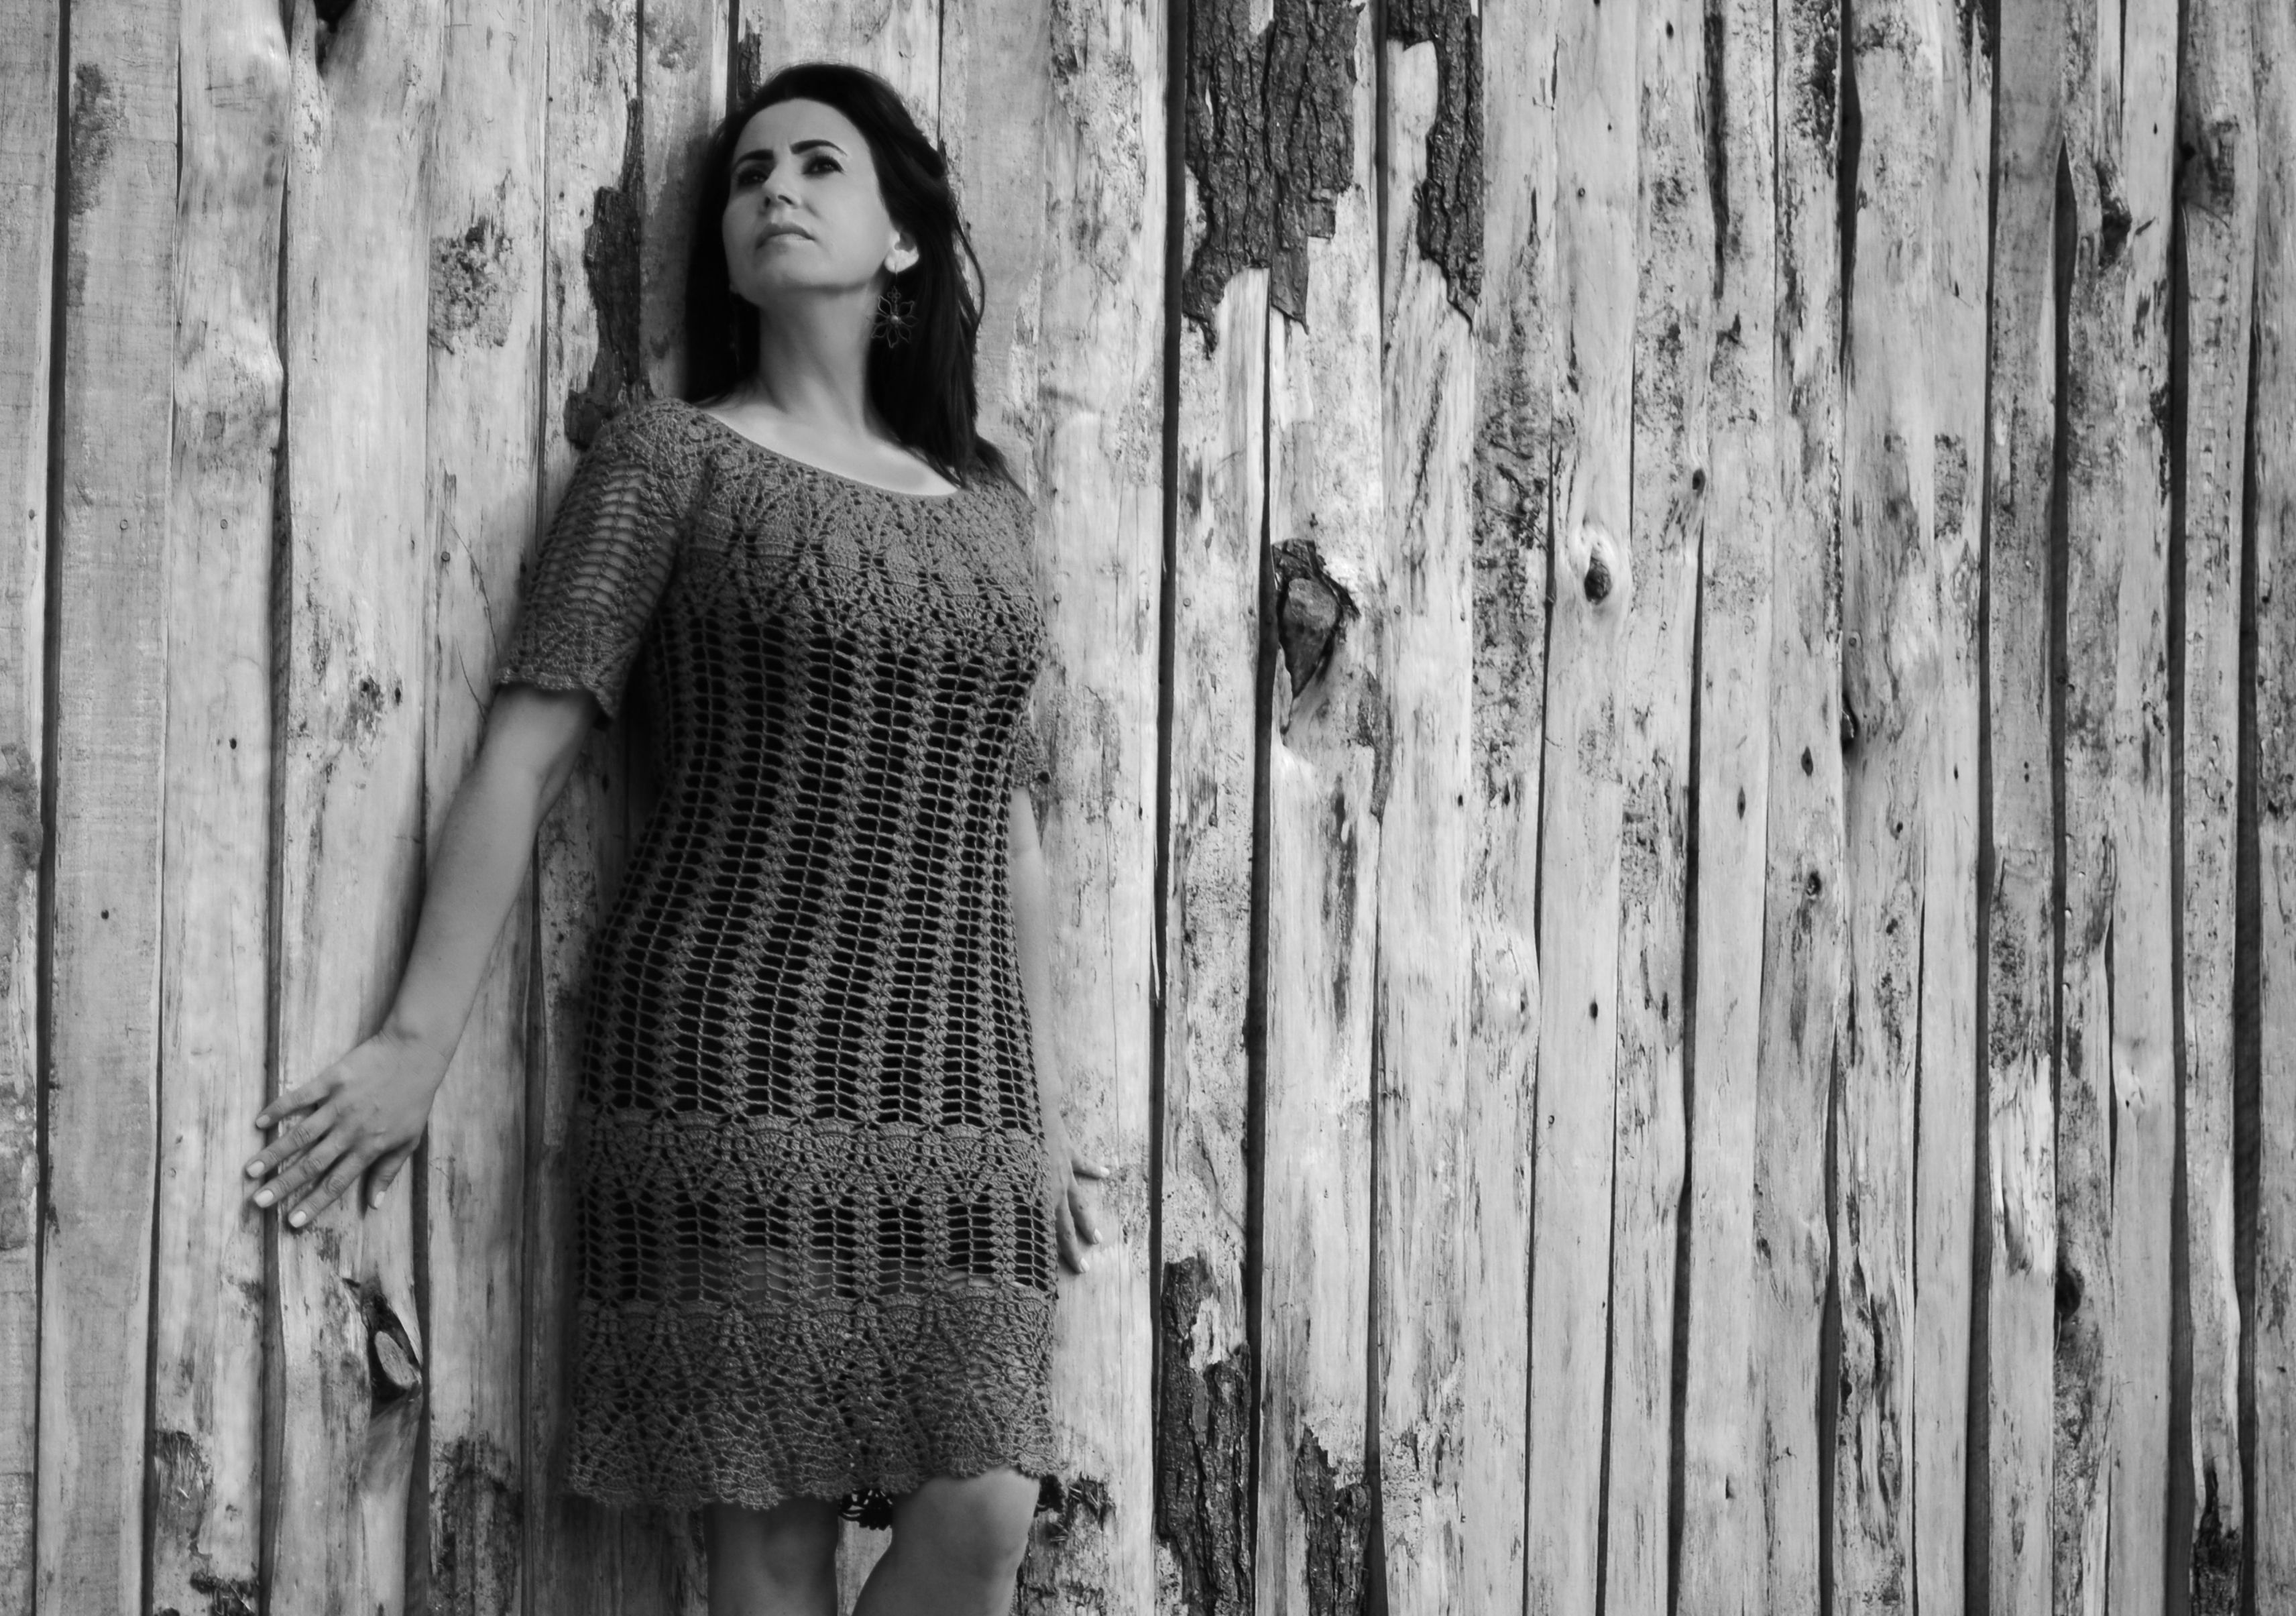 Vestido de croché. Foto: Júnior Scoz